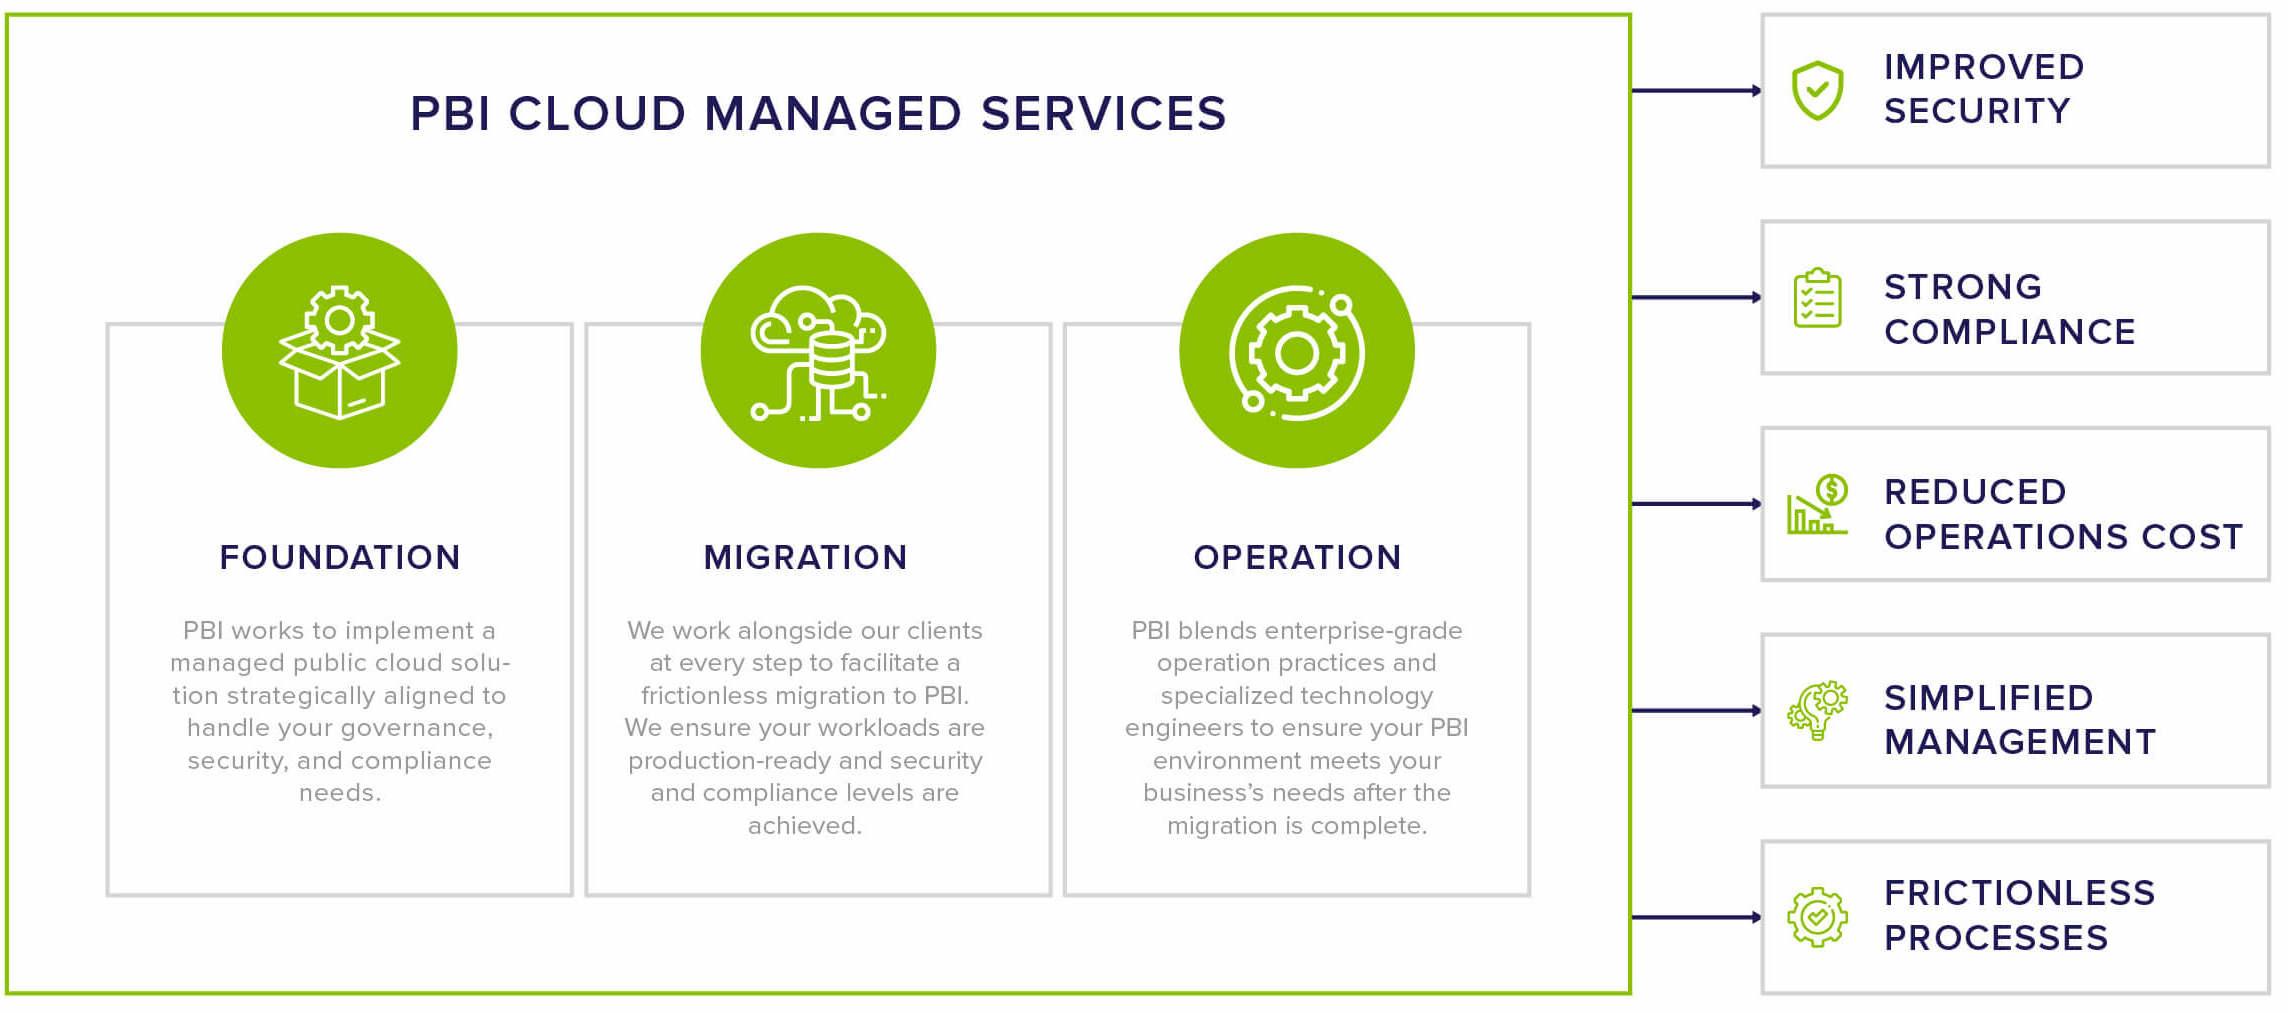 Portfolio BI Cloud Managed Services How It Works